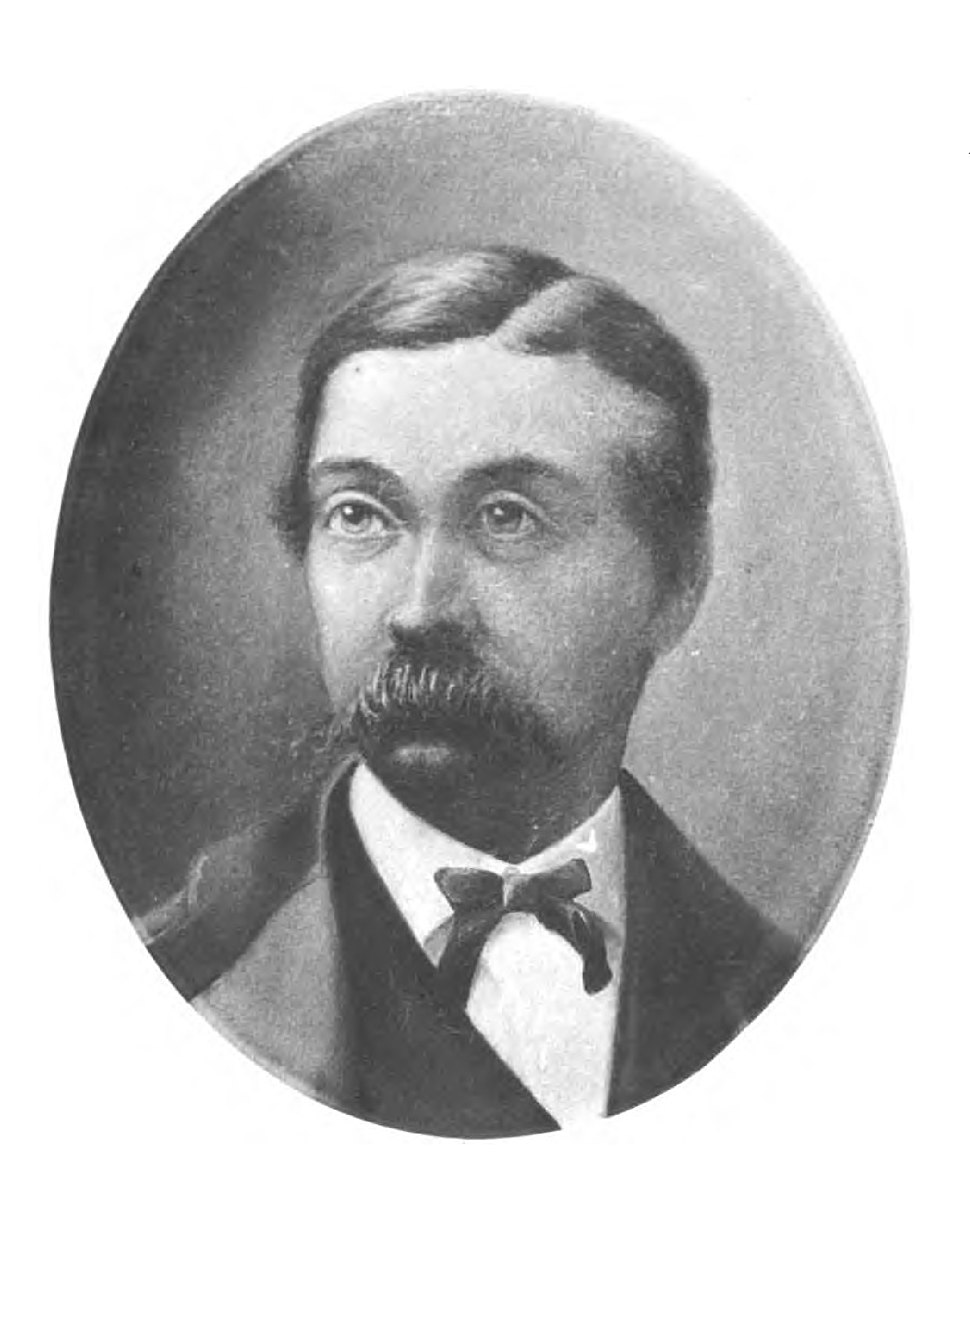 Sketch of Fitz-James O'Brien by William Winter 1881